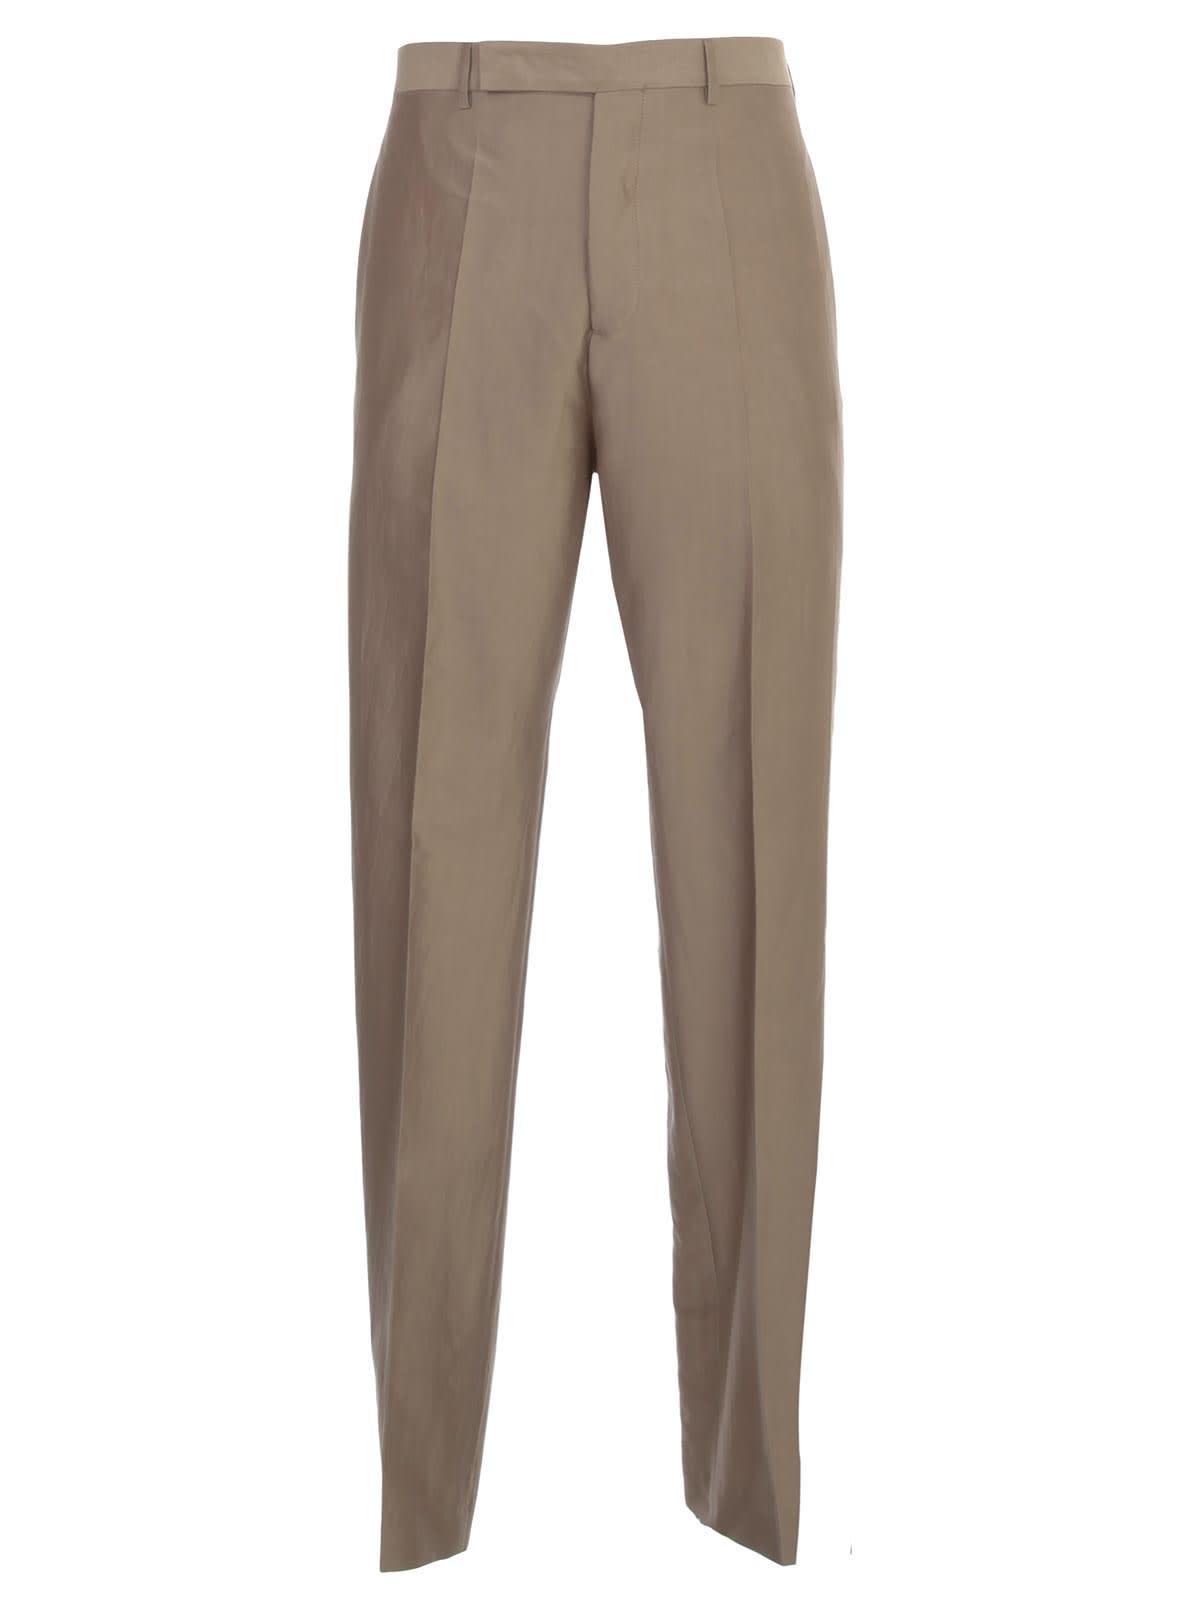 Pants Slim Silk And Cotton